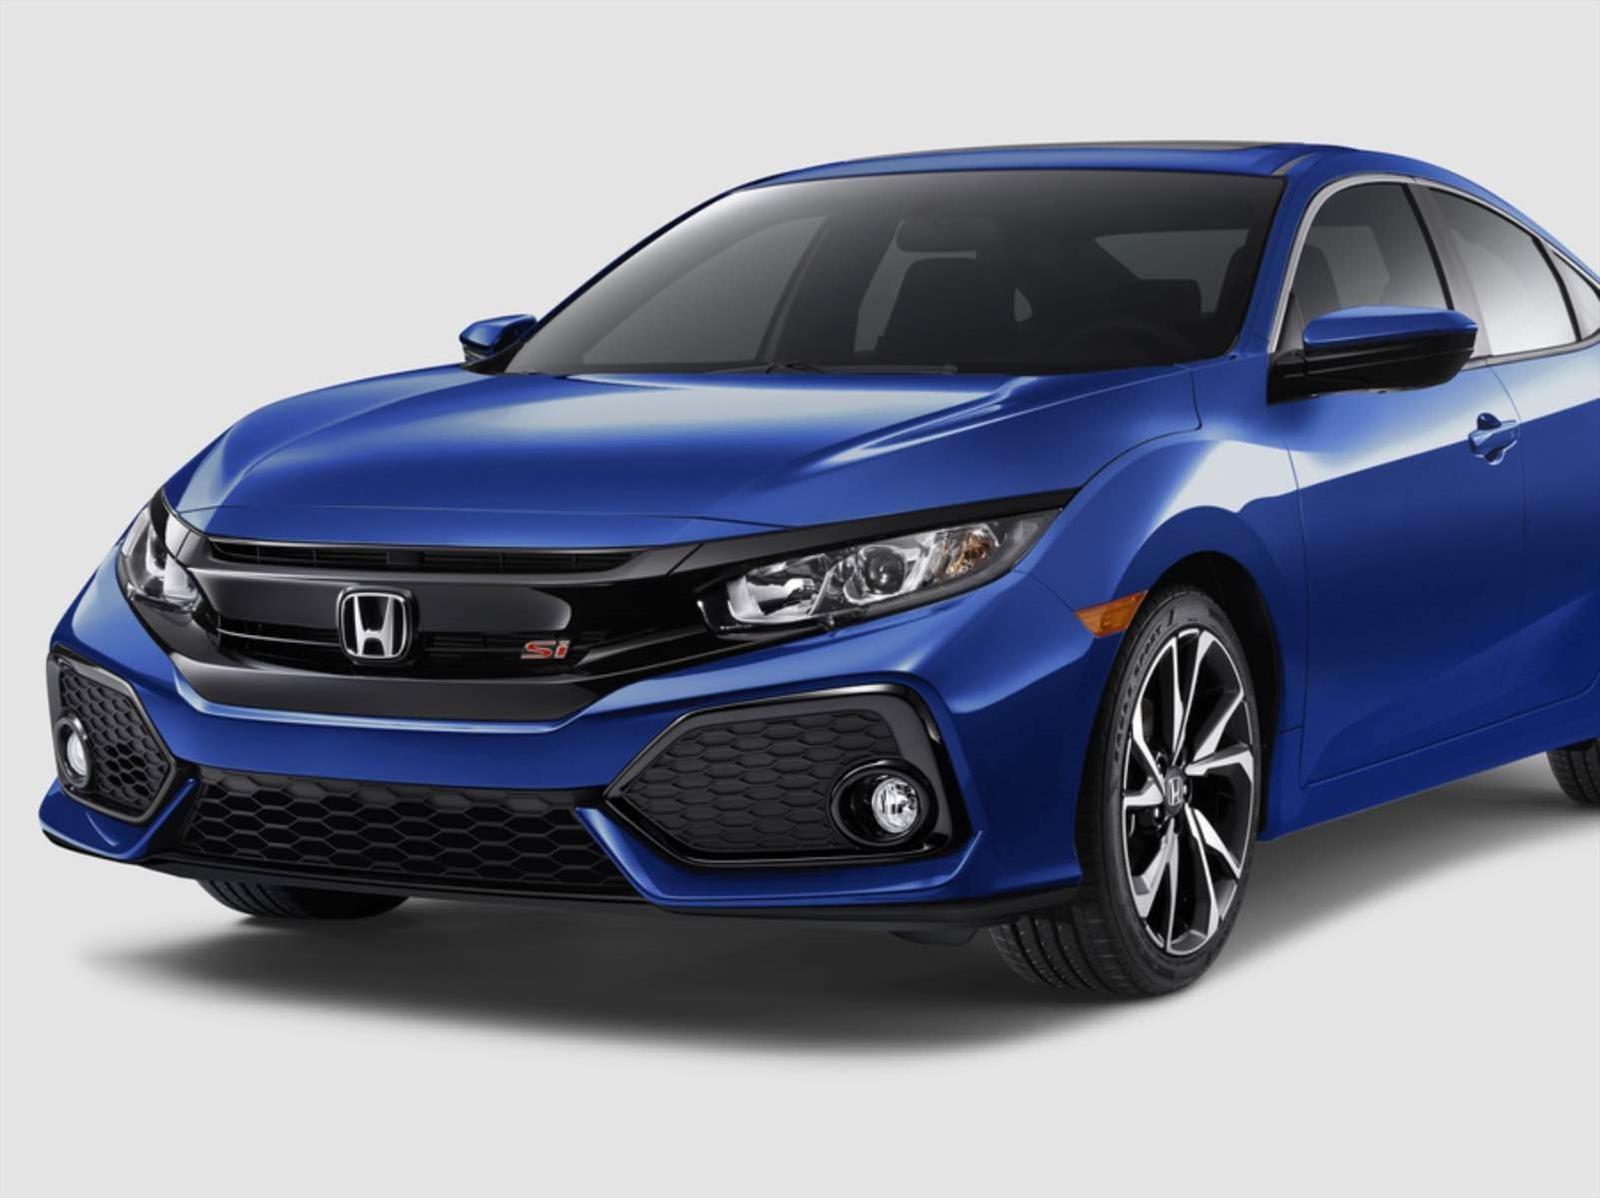 Auto show de nueva york 2017 honda civic si 2018 el for Honda civic si automatic